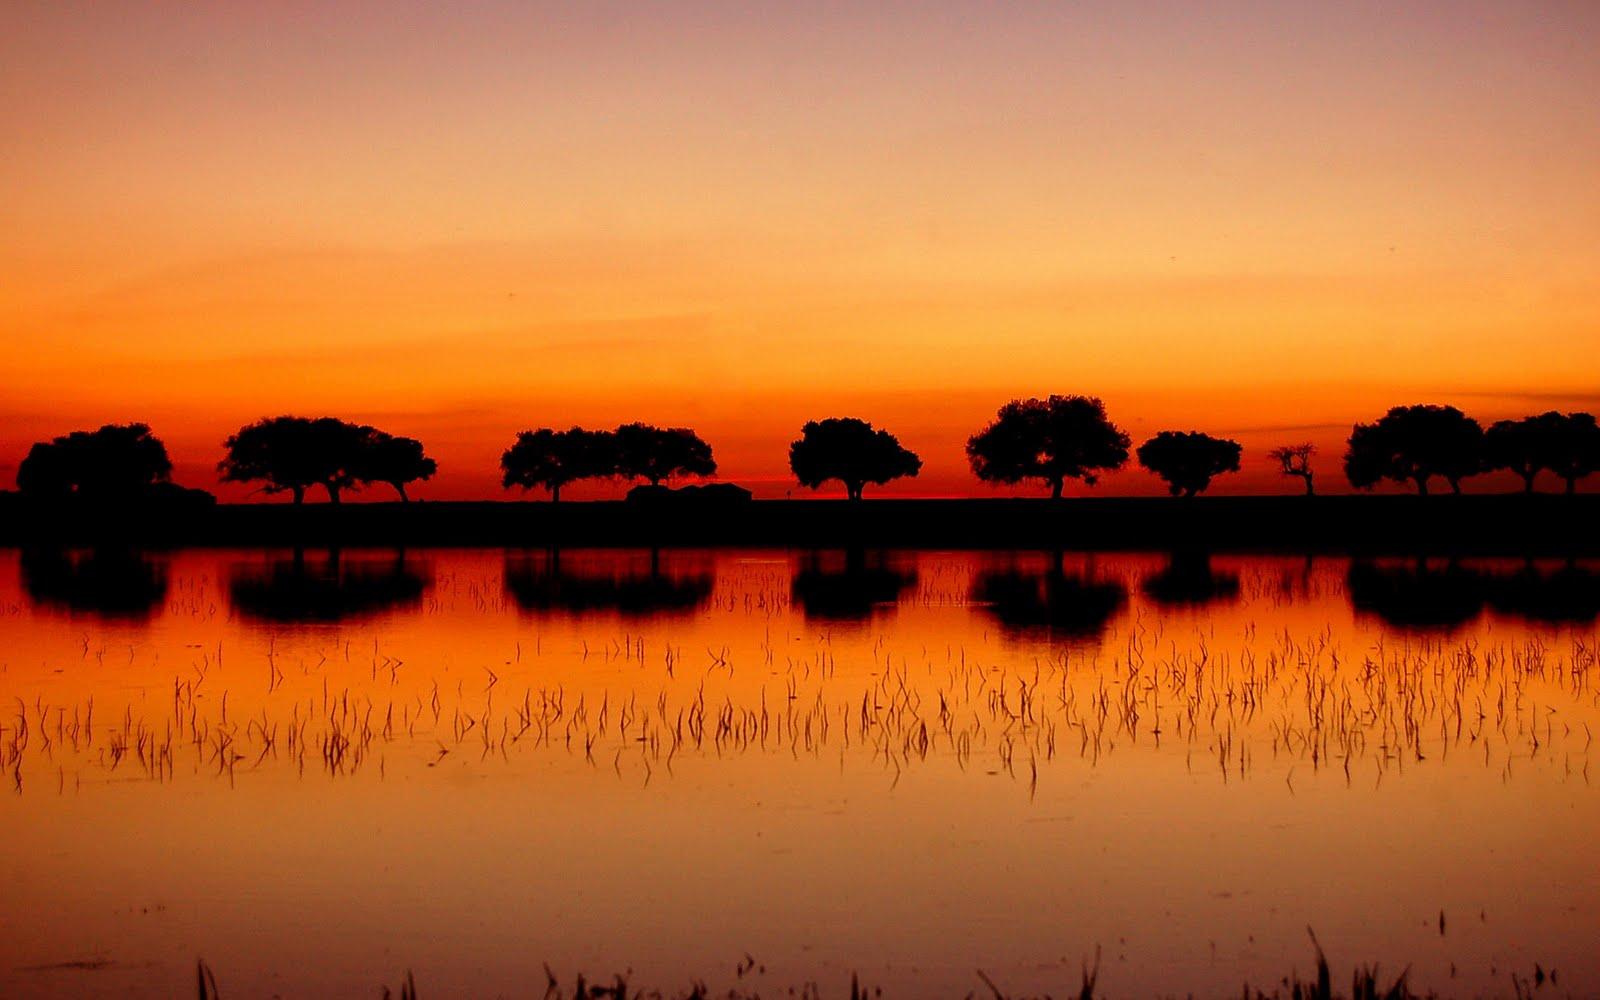 http://3.bp.blogspot.com/_3UZ_N8Qdang/THmGcnyNAbI/AAAAAAAAC4I/gboOqYZslSg/s1600/Best_Nature_www.laba.ws_+004.jpg